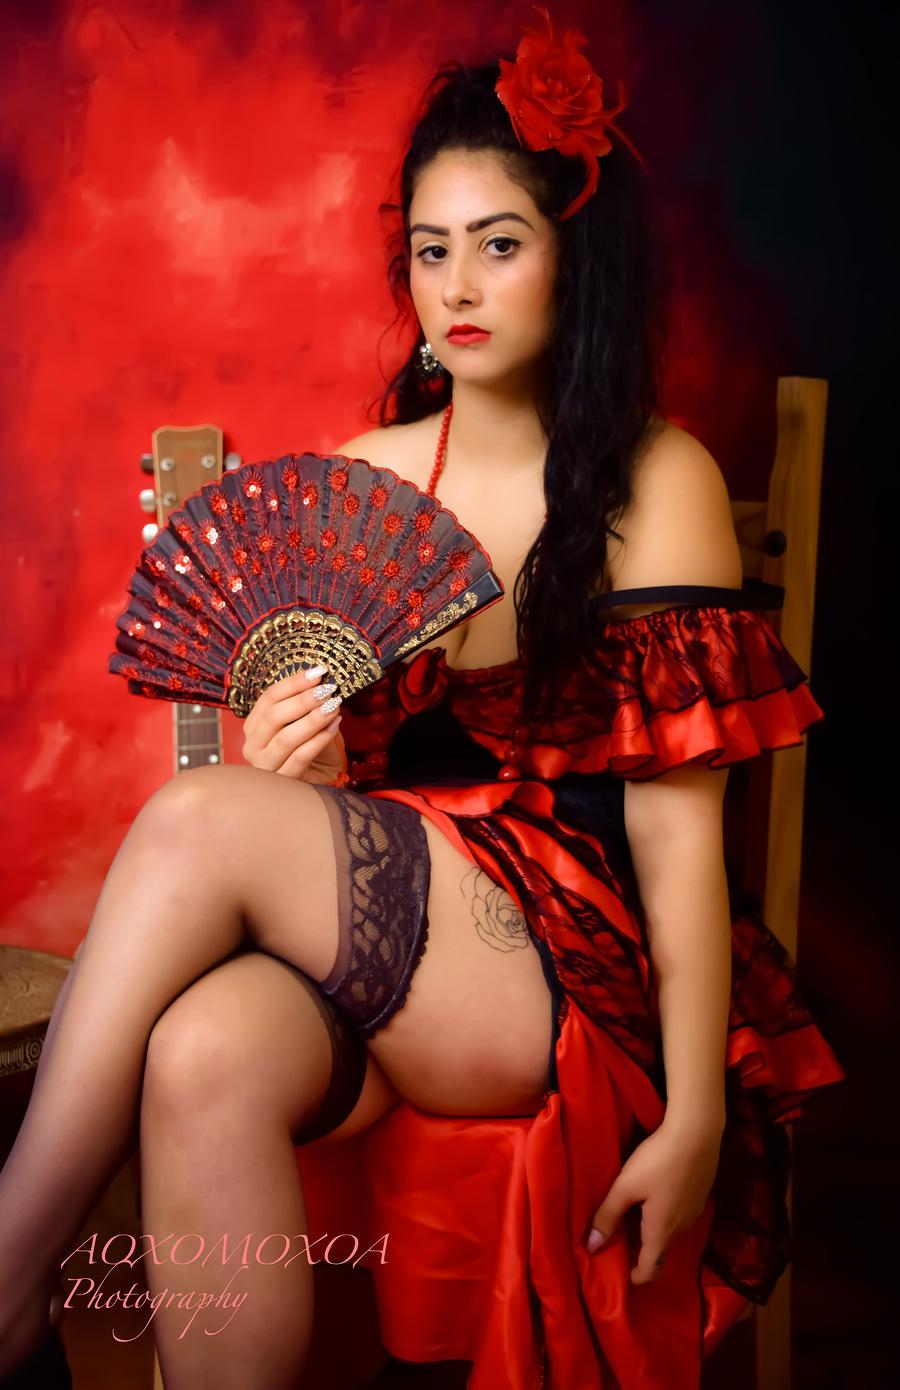 Photography by Aoxomoxoa, Model Babycaramela / Uploaded 15th November 2017 @ 05:11 PM